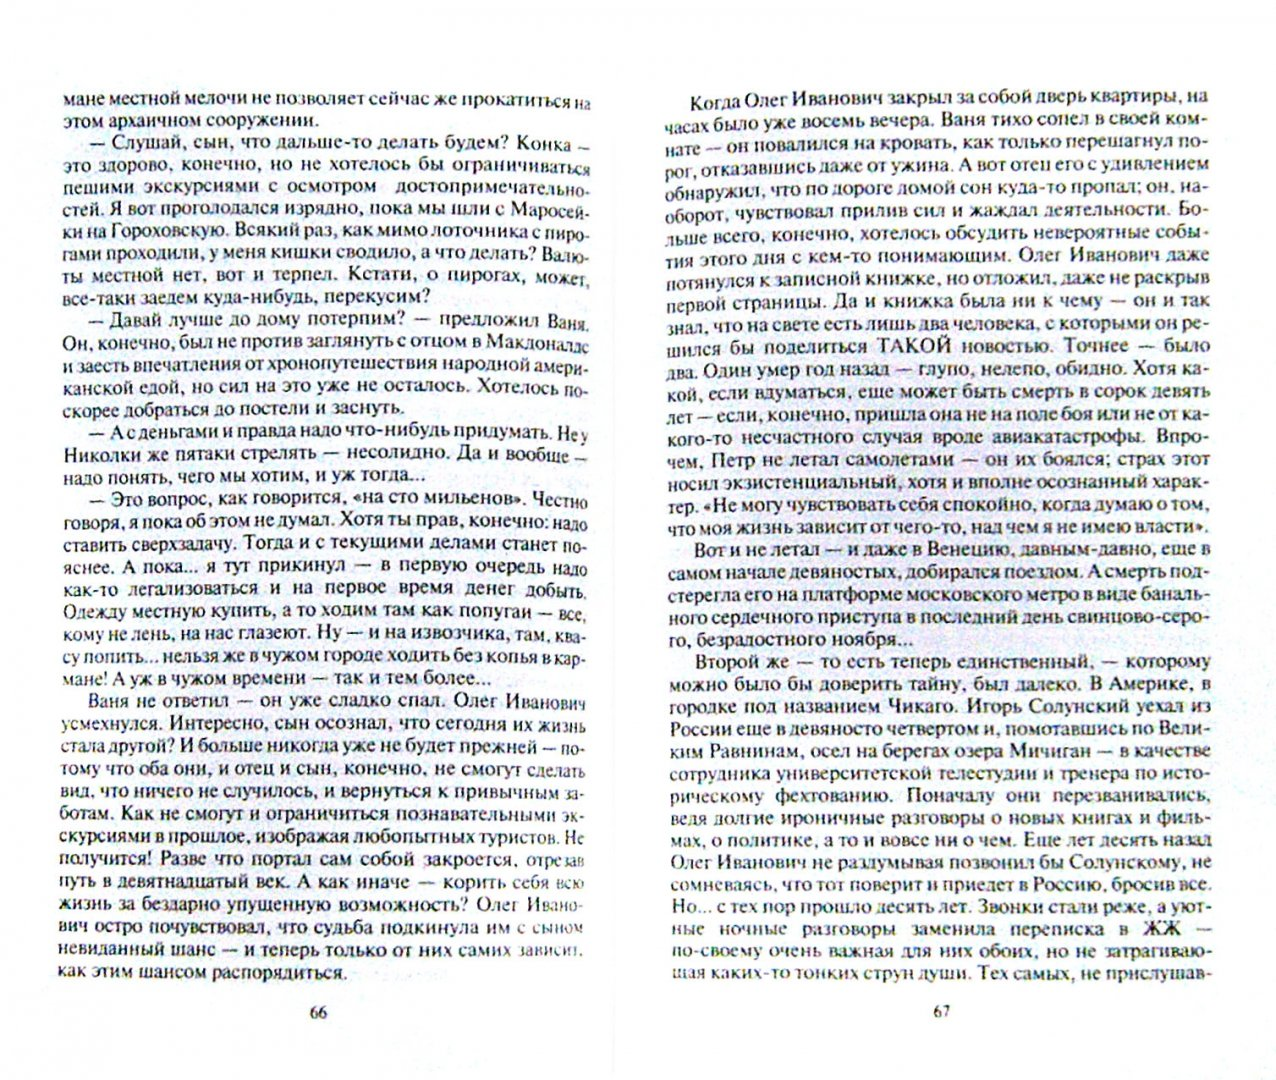 Иллюстрация 1 из 13 для Коптский крест - Борис Батыршин | Лабиринт - книги. Источник: Лабиринт